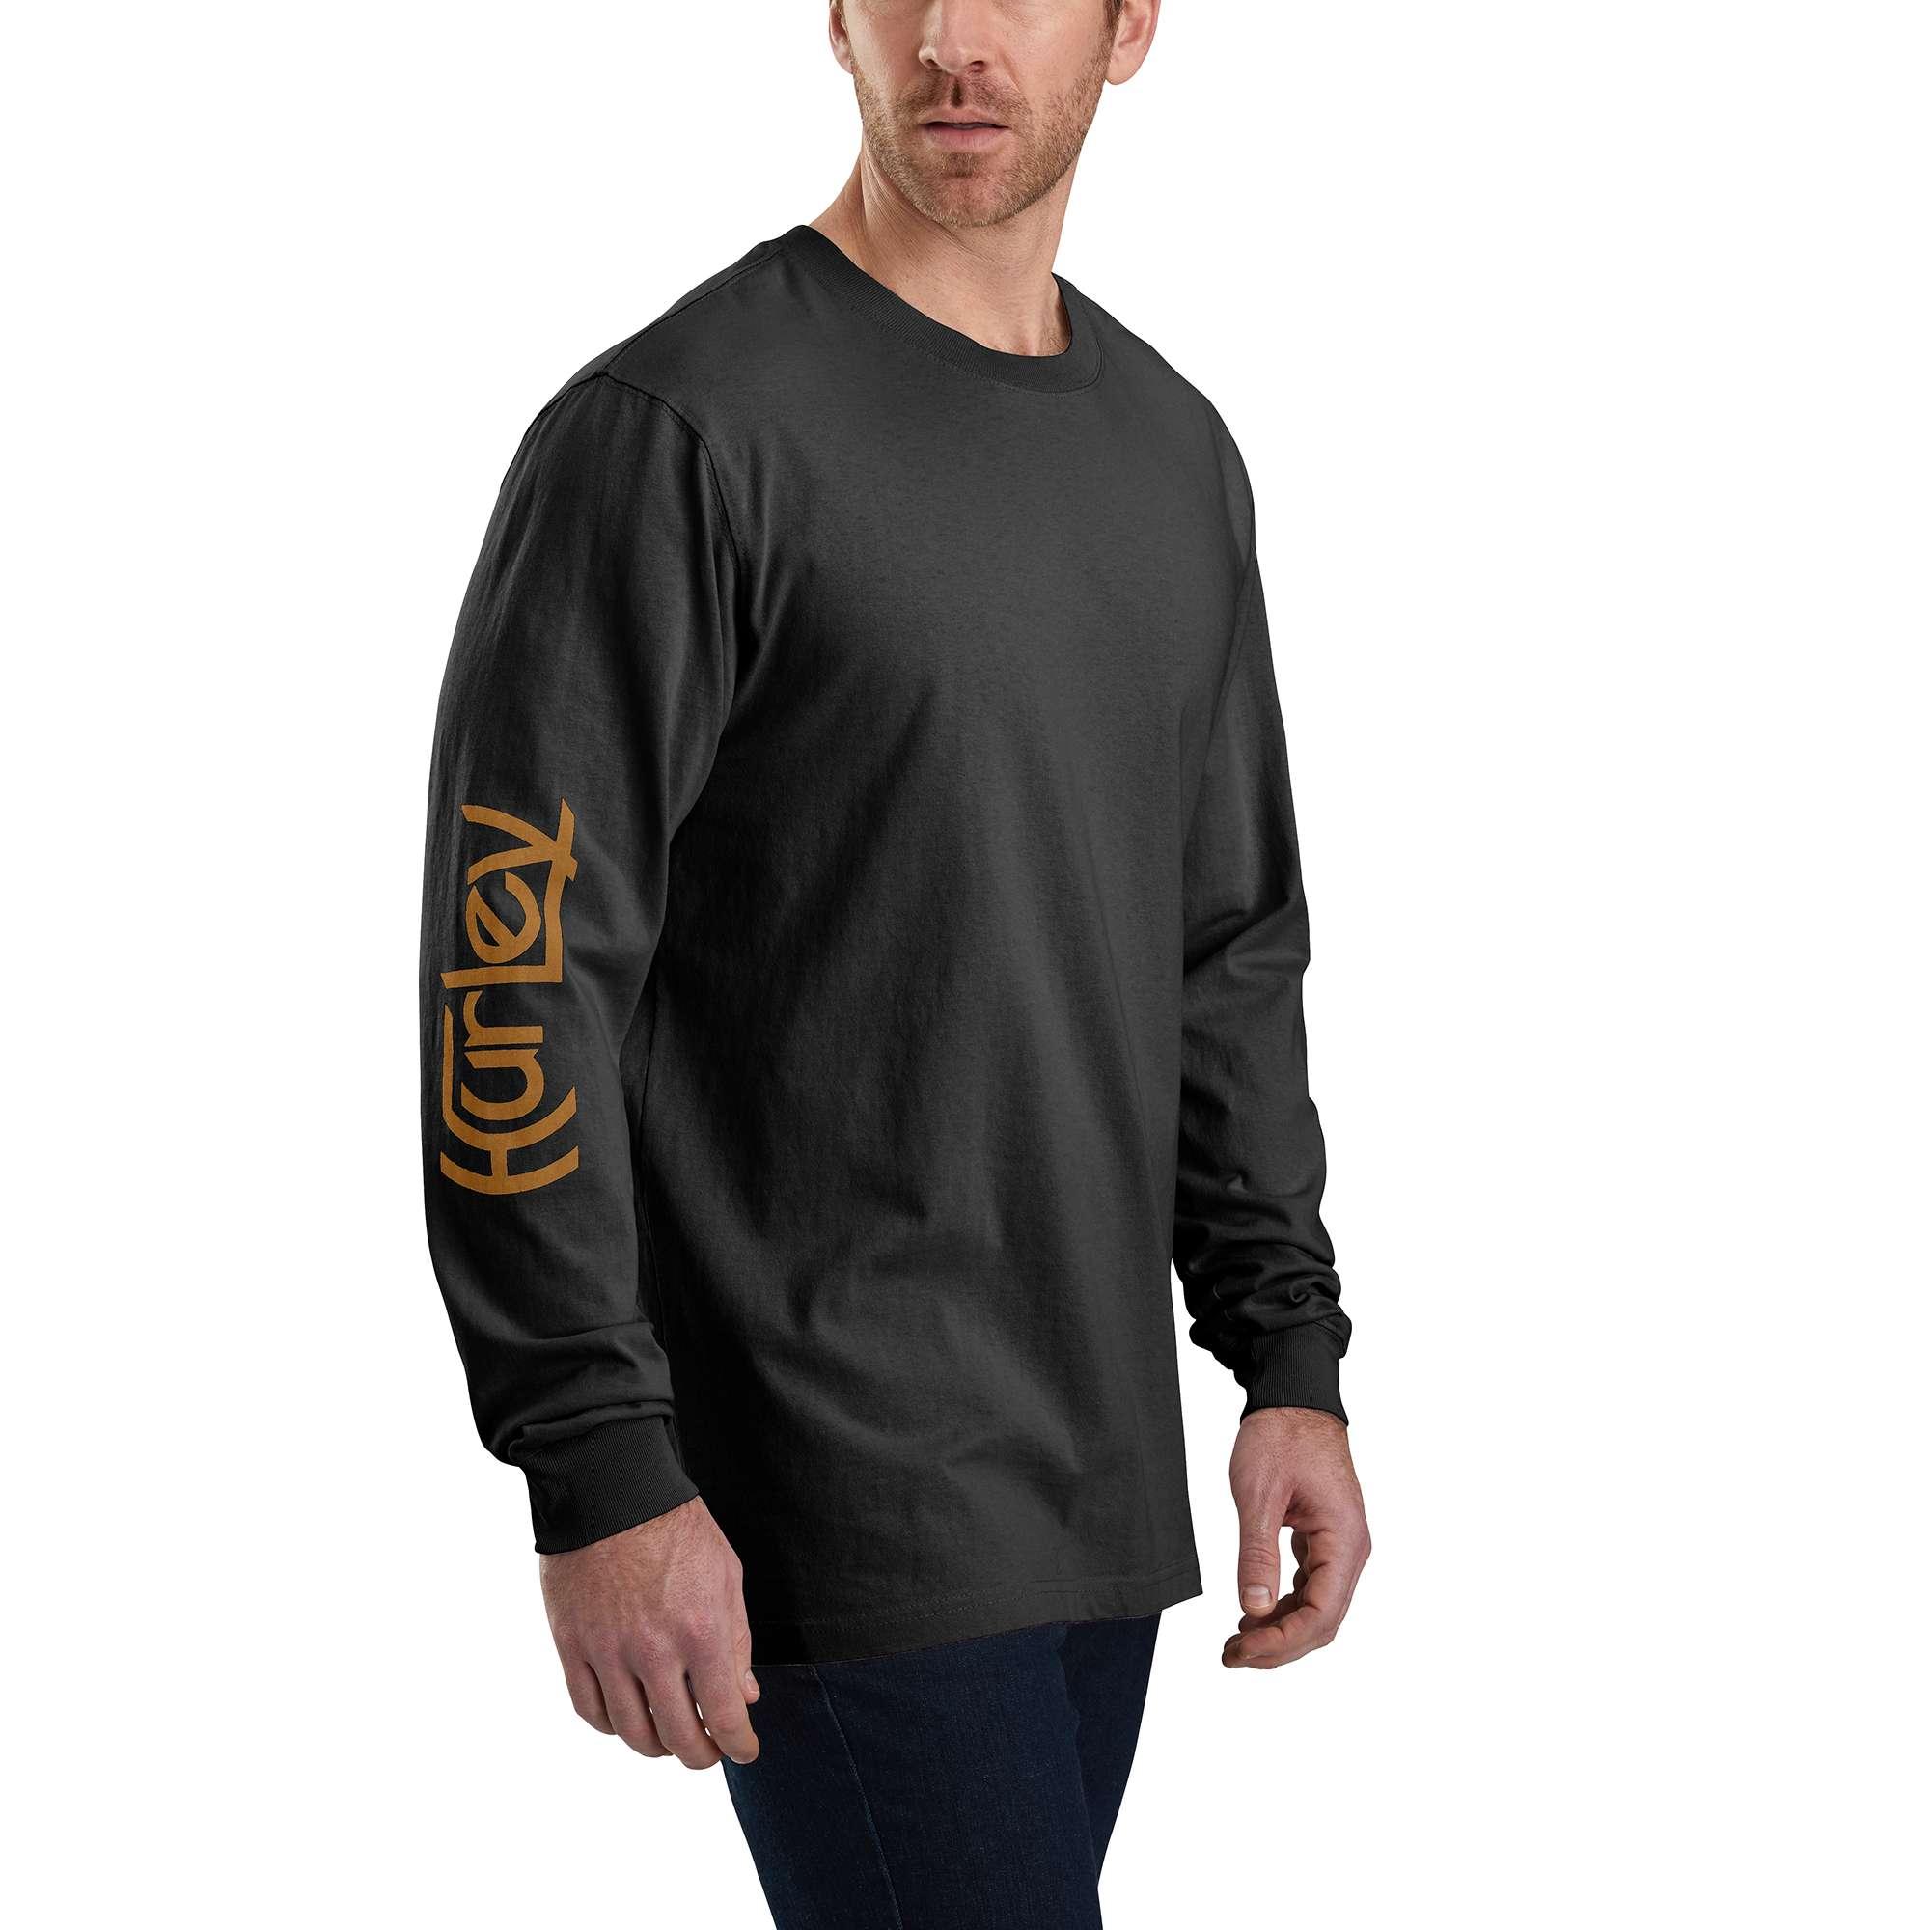 Carhartt Hurley x Carhartt Unisex Long-Sleeve T-Shirt